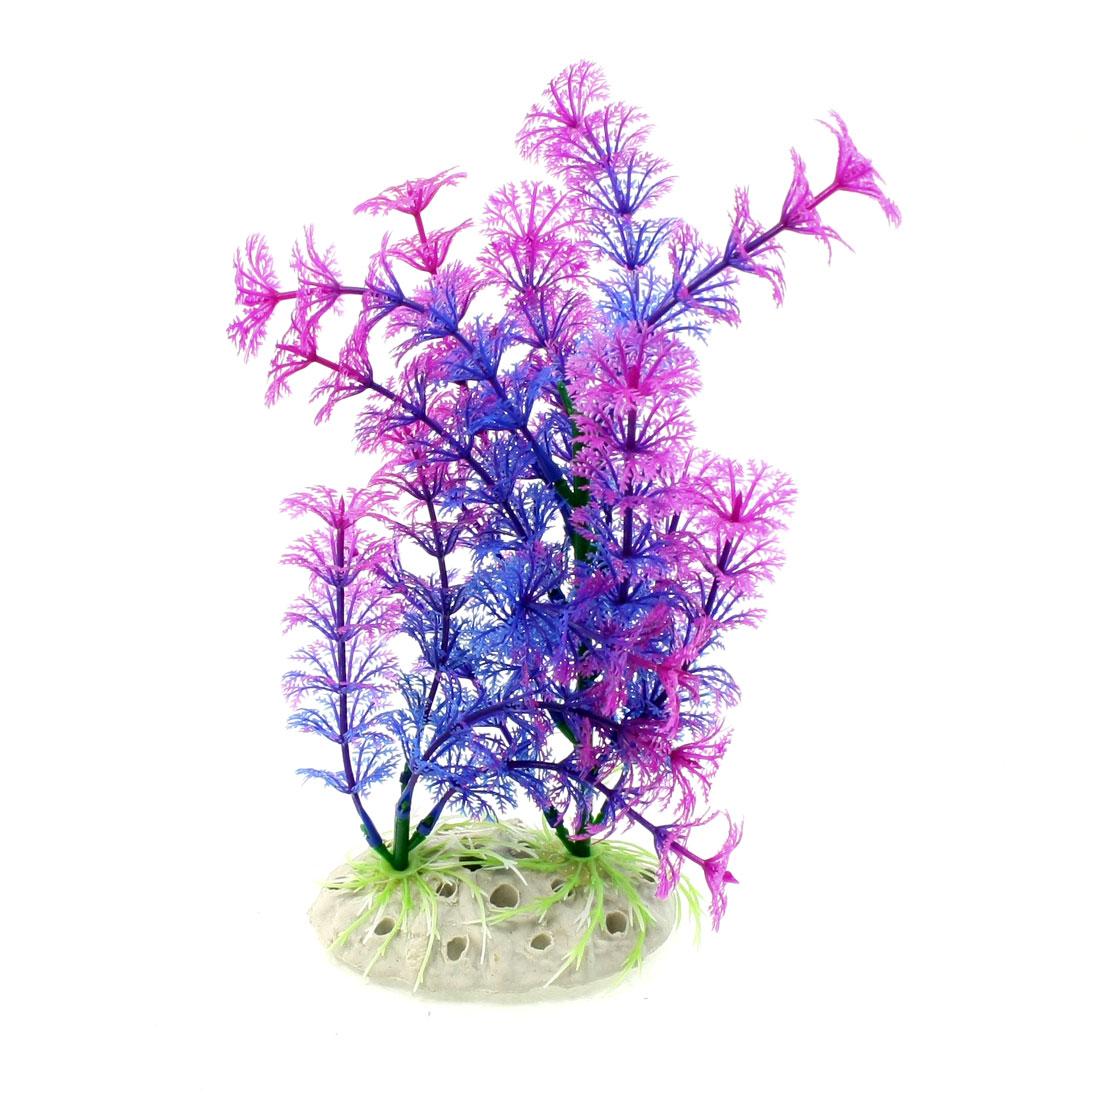 "9.4"" Height Simulation Violet Blue Aquatic Plant Ornament for Aquarium"